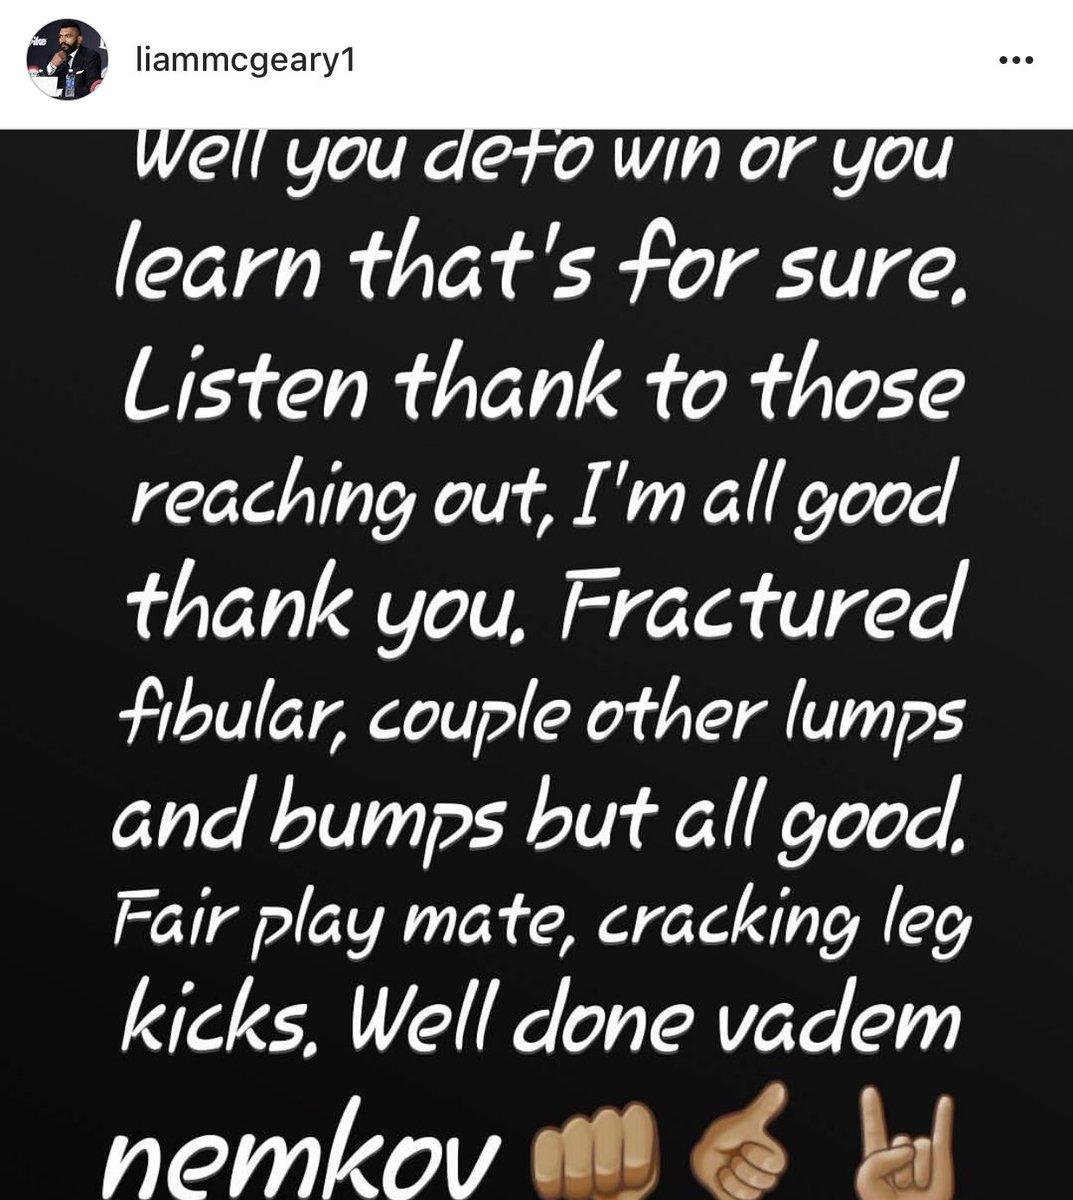 Liam McGeary reveals he got a fractured fibula in the Vadim Nemkov ...